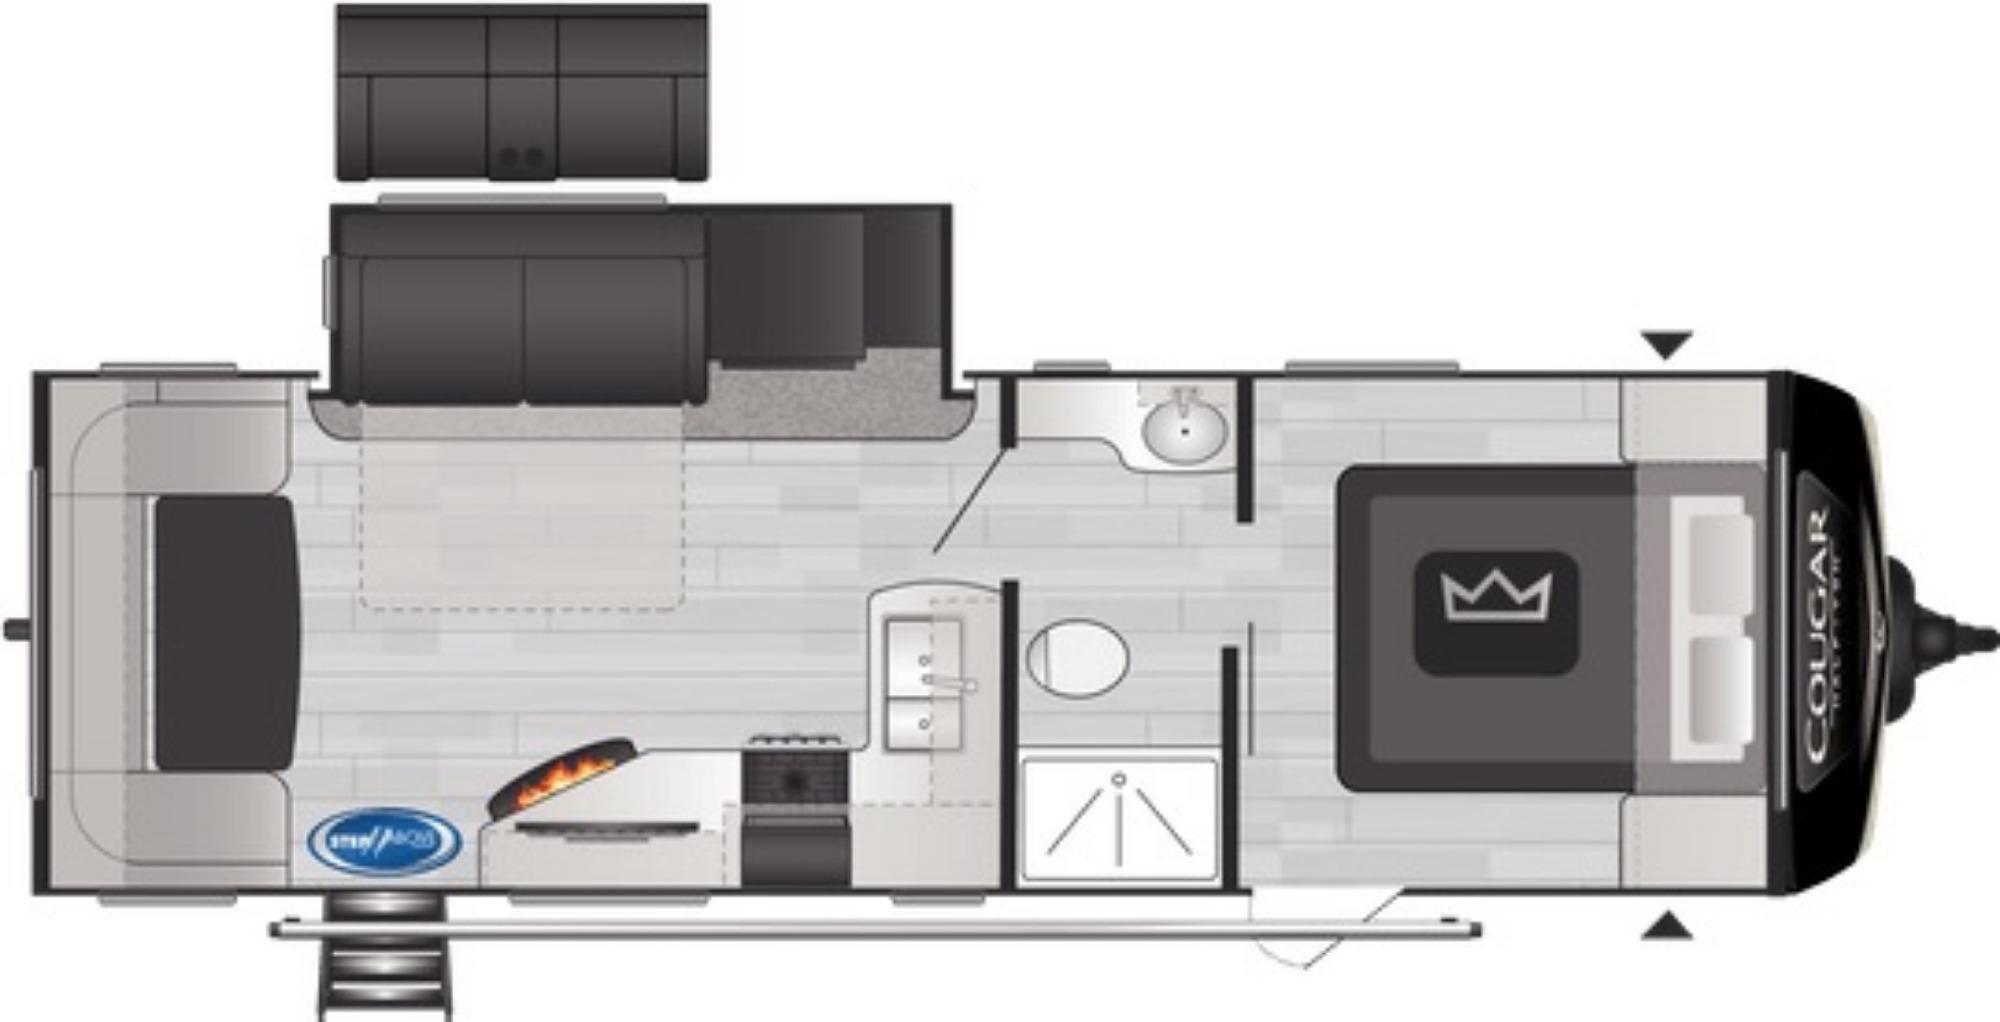 View Floor Plan for 2021 KEYSTONE COUGAR 25RDSWE